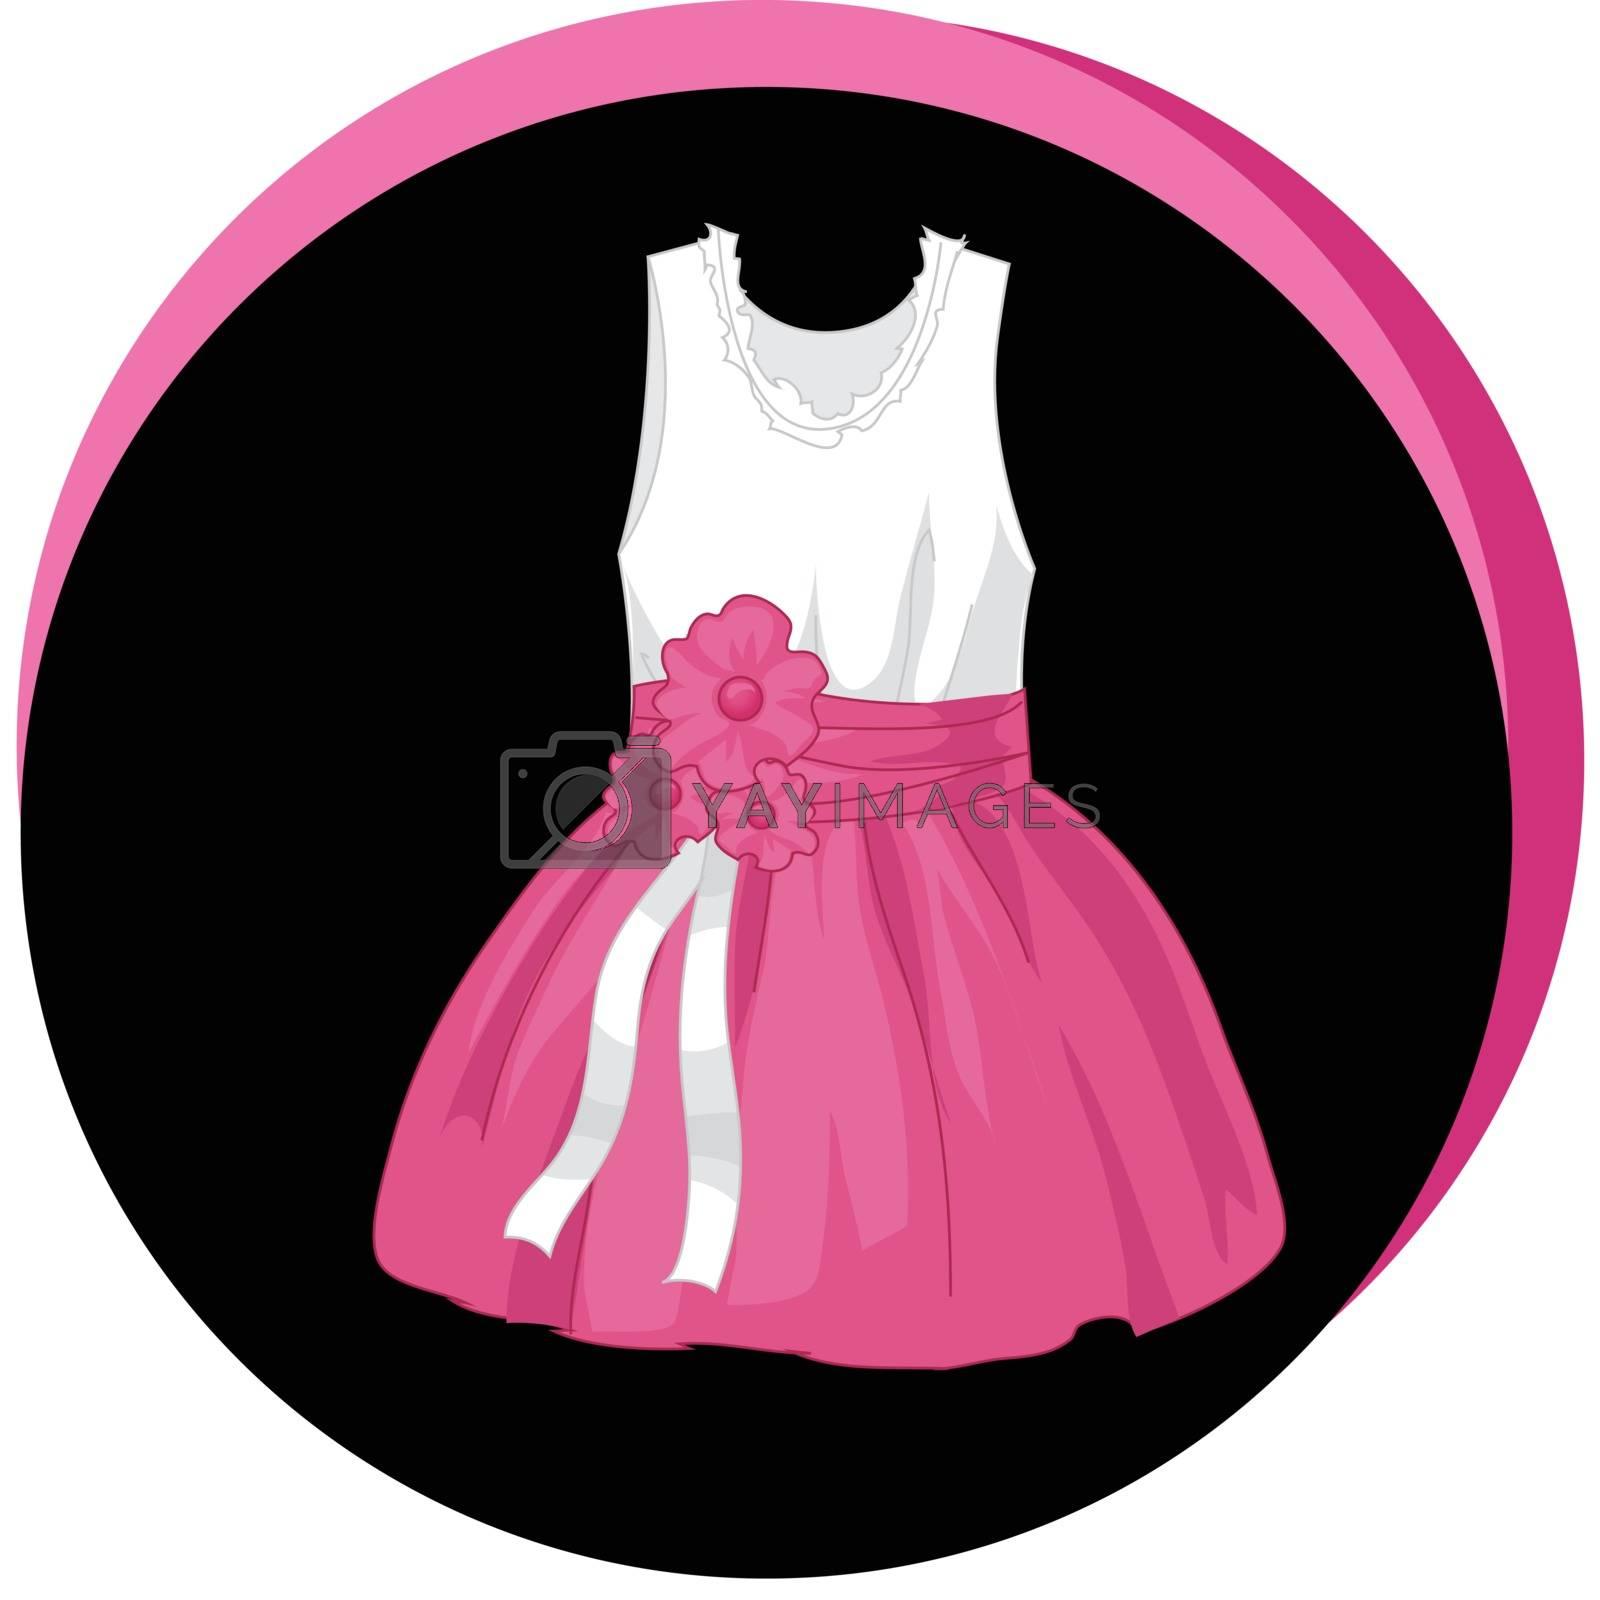 Fashion Vector Illustration. Stylish dress icon. Elegant outfit